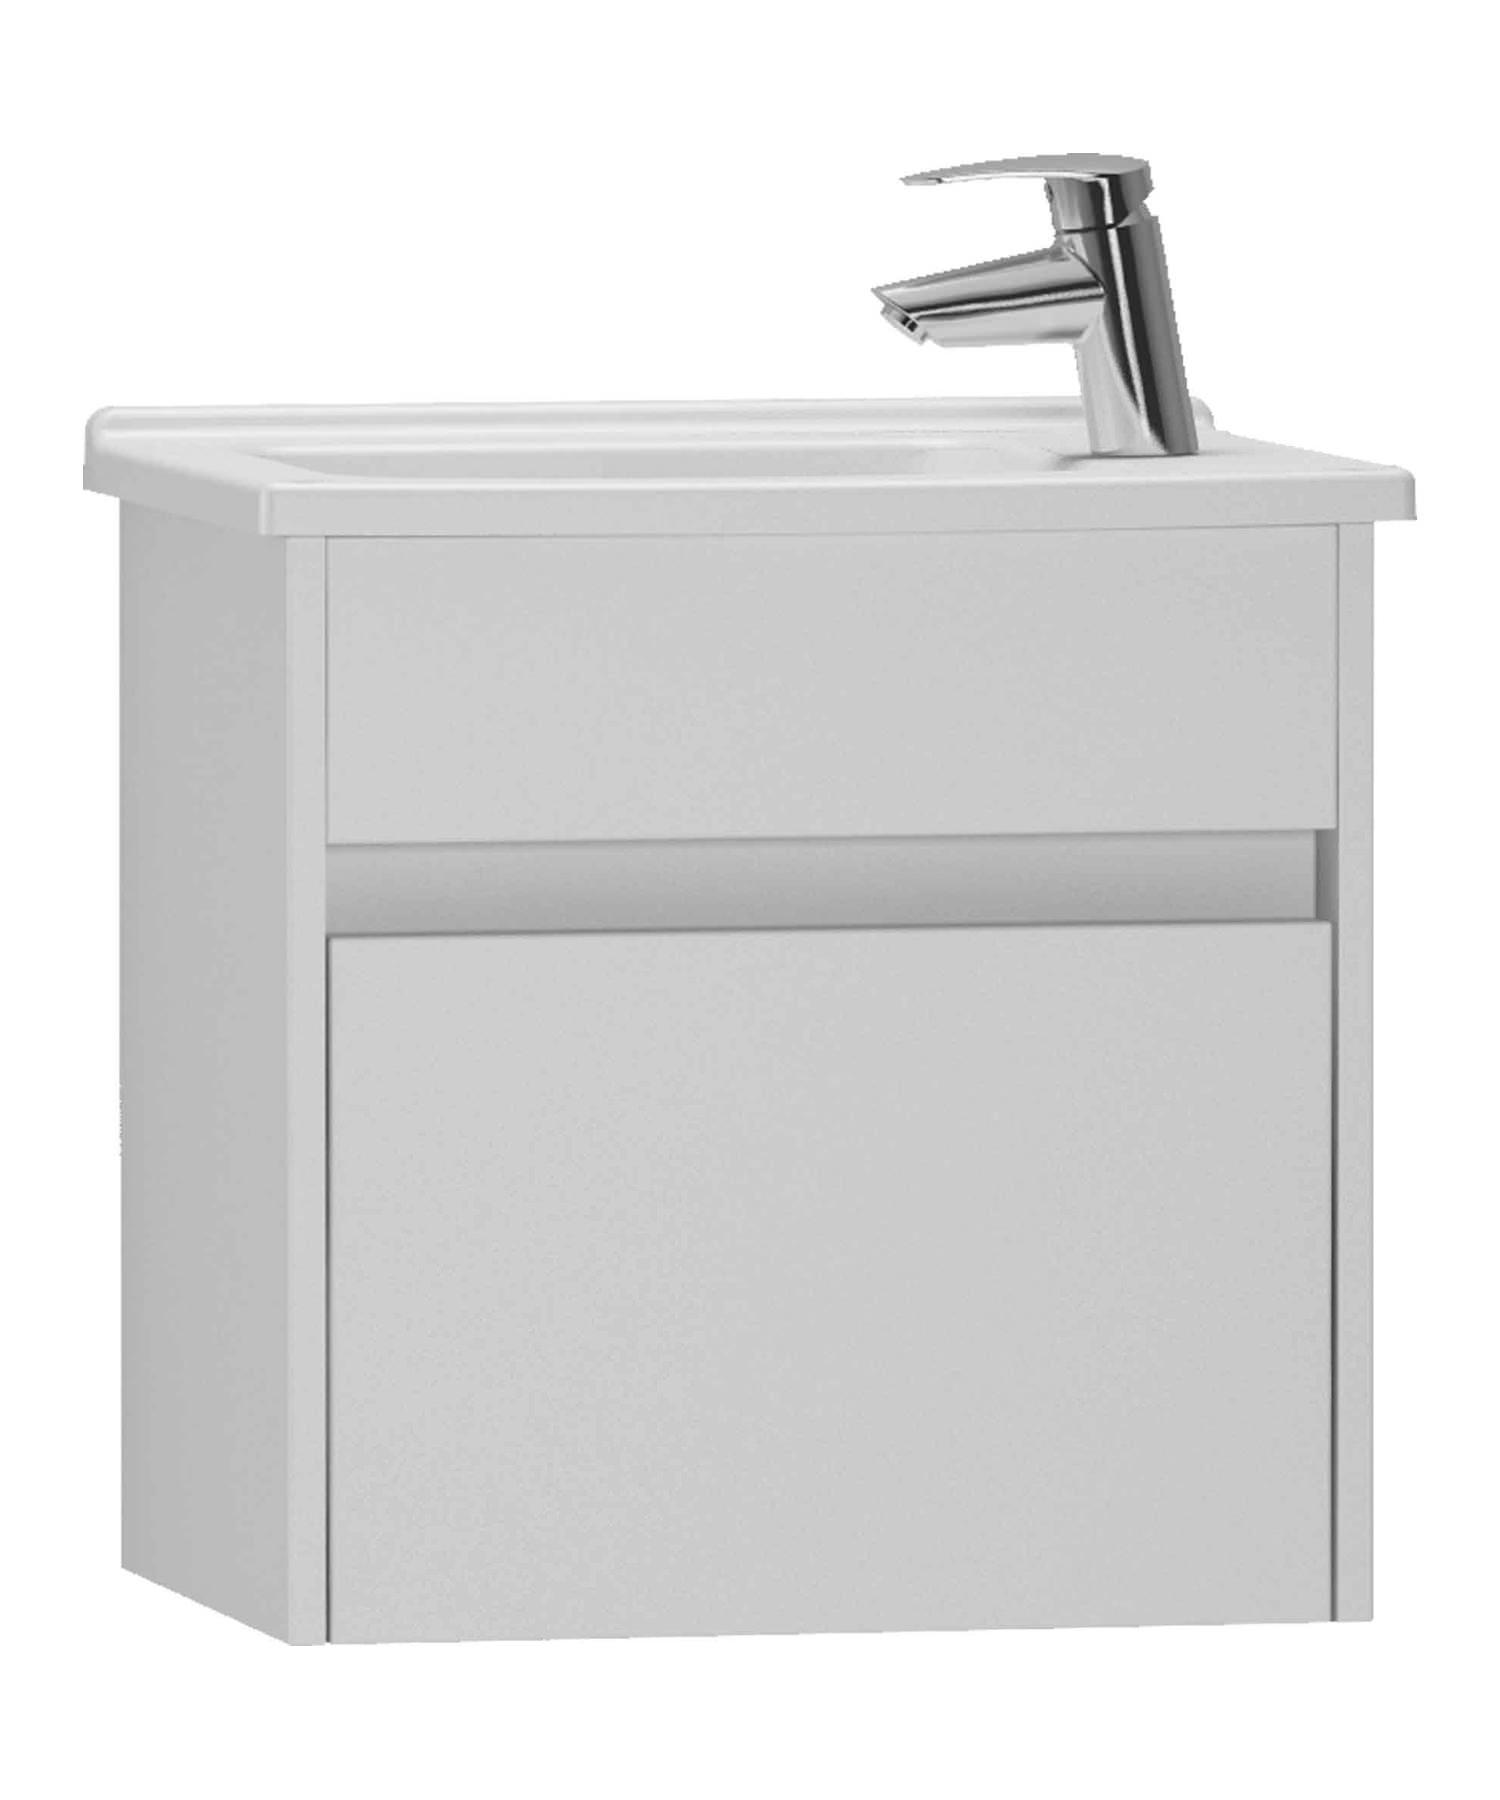 Vitra S50 High Gloss White 500mm Compact Washbasin Unit